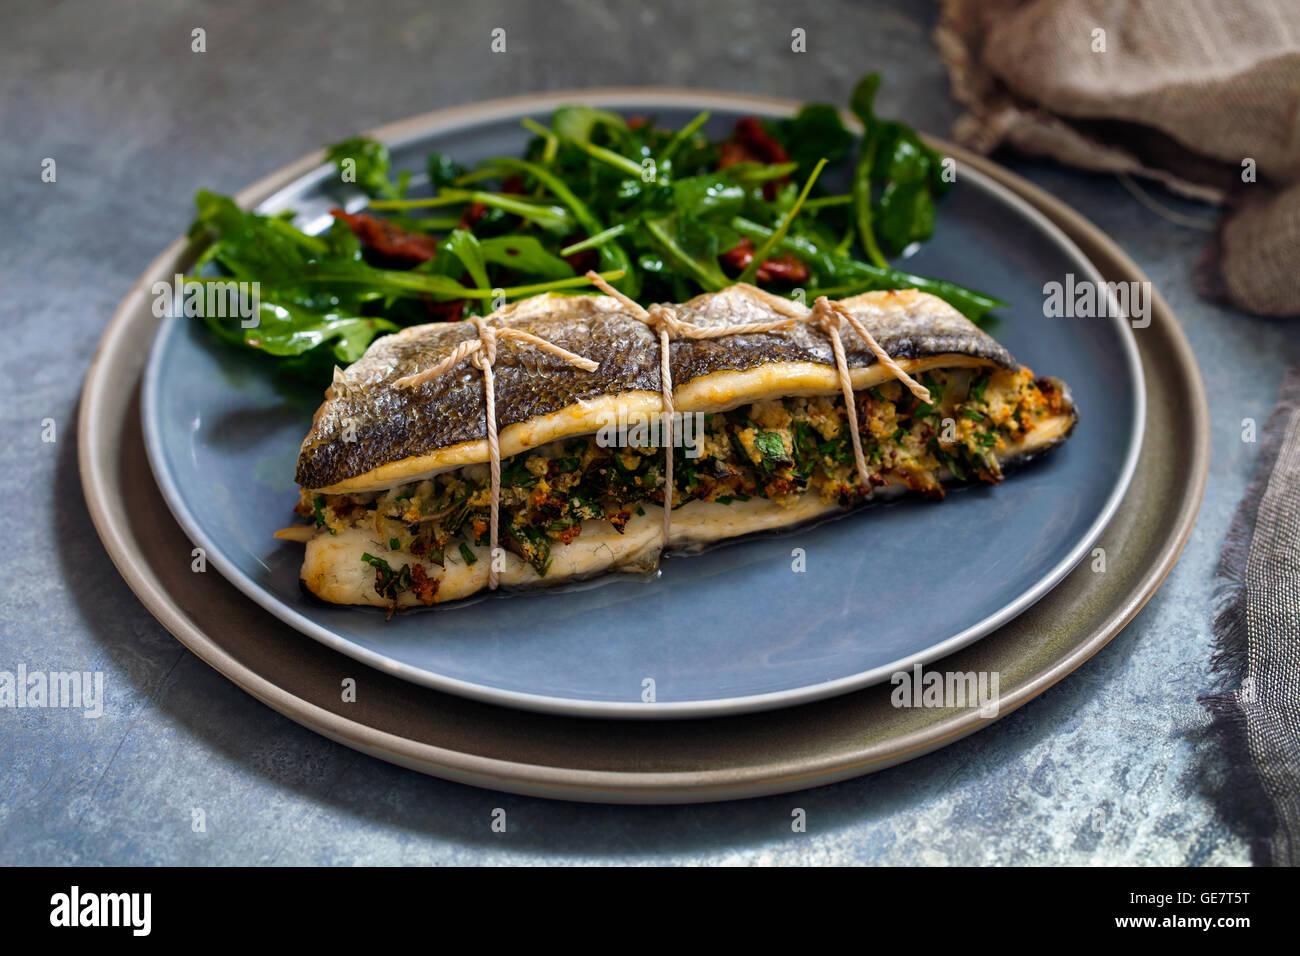 Loup de mer farcies avec une salade Photo Stock